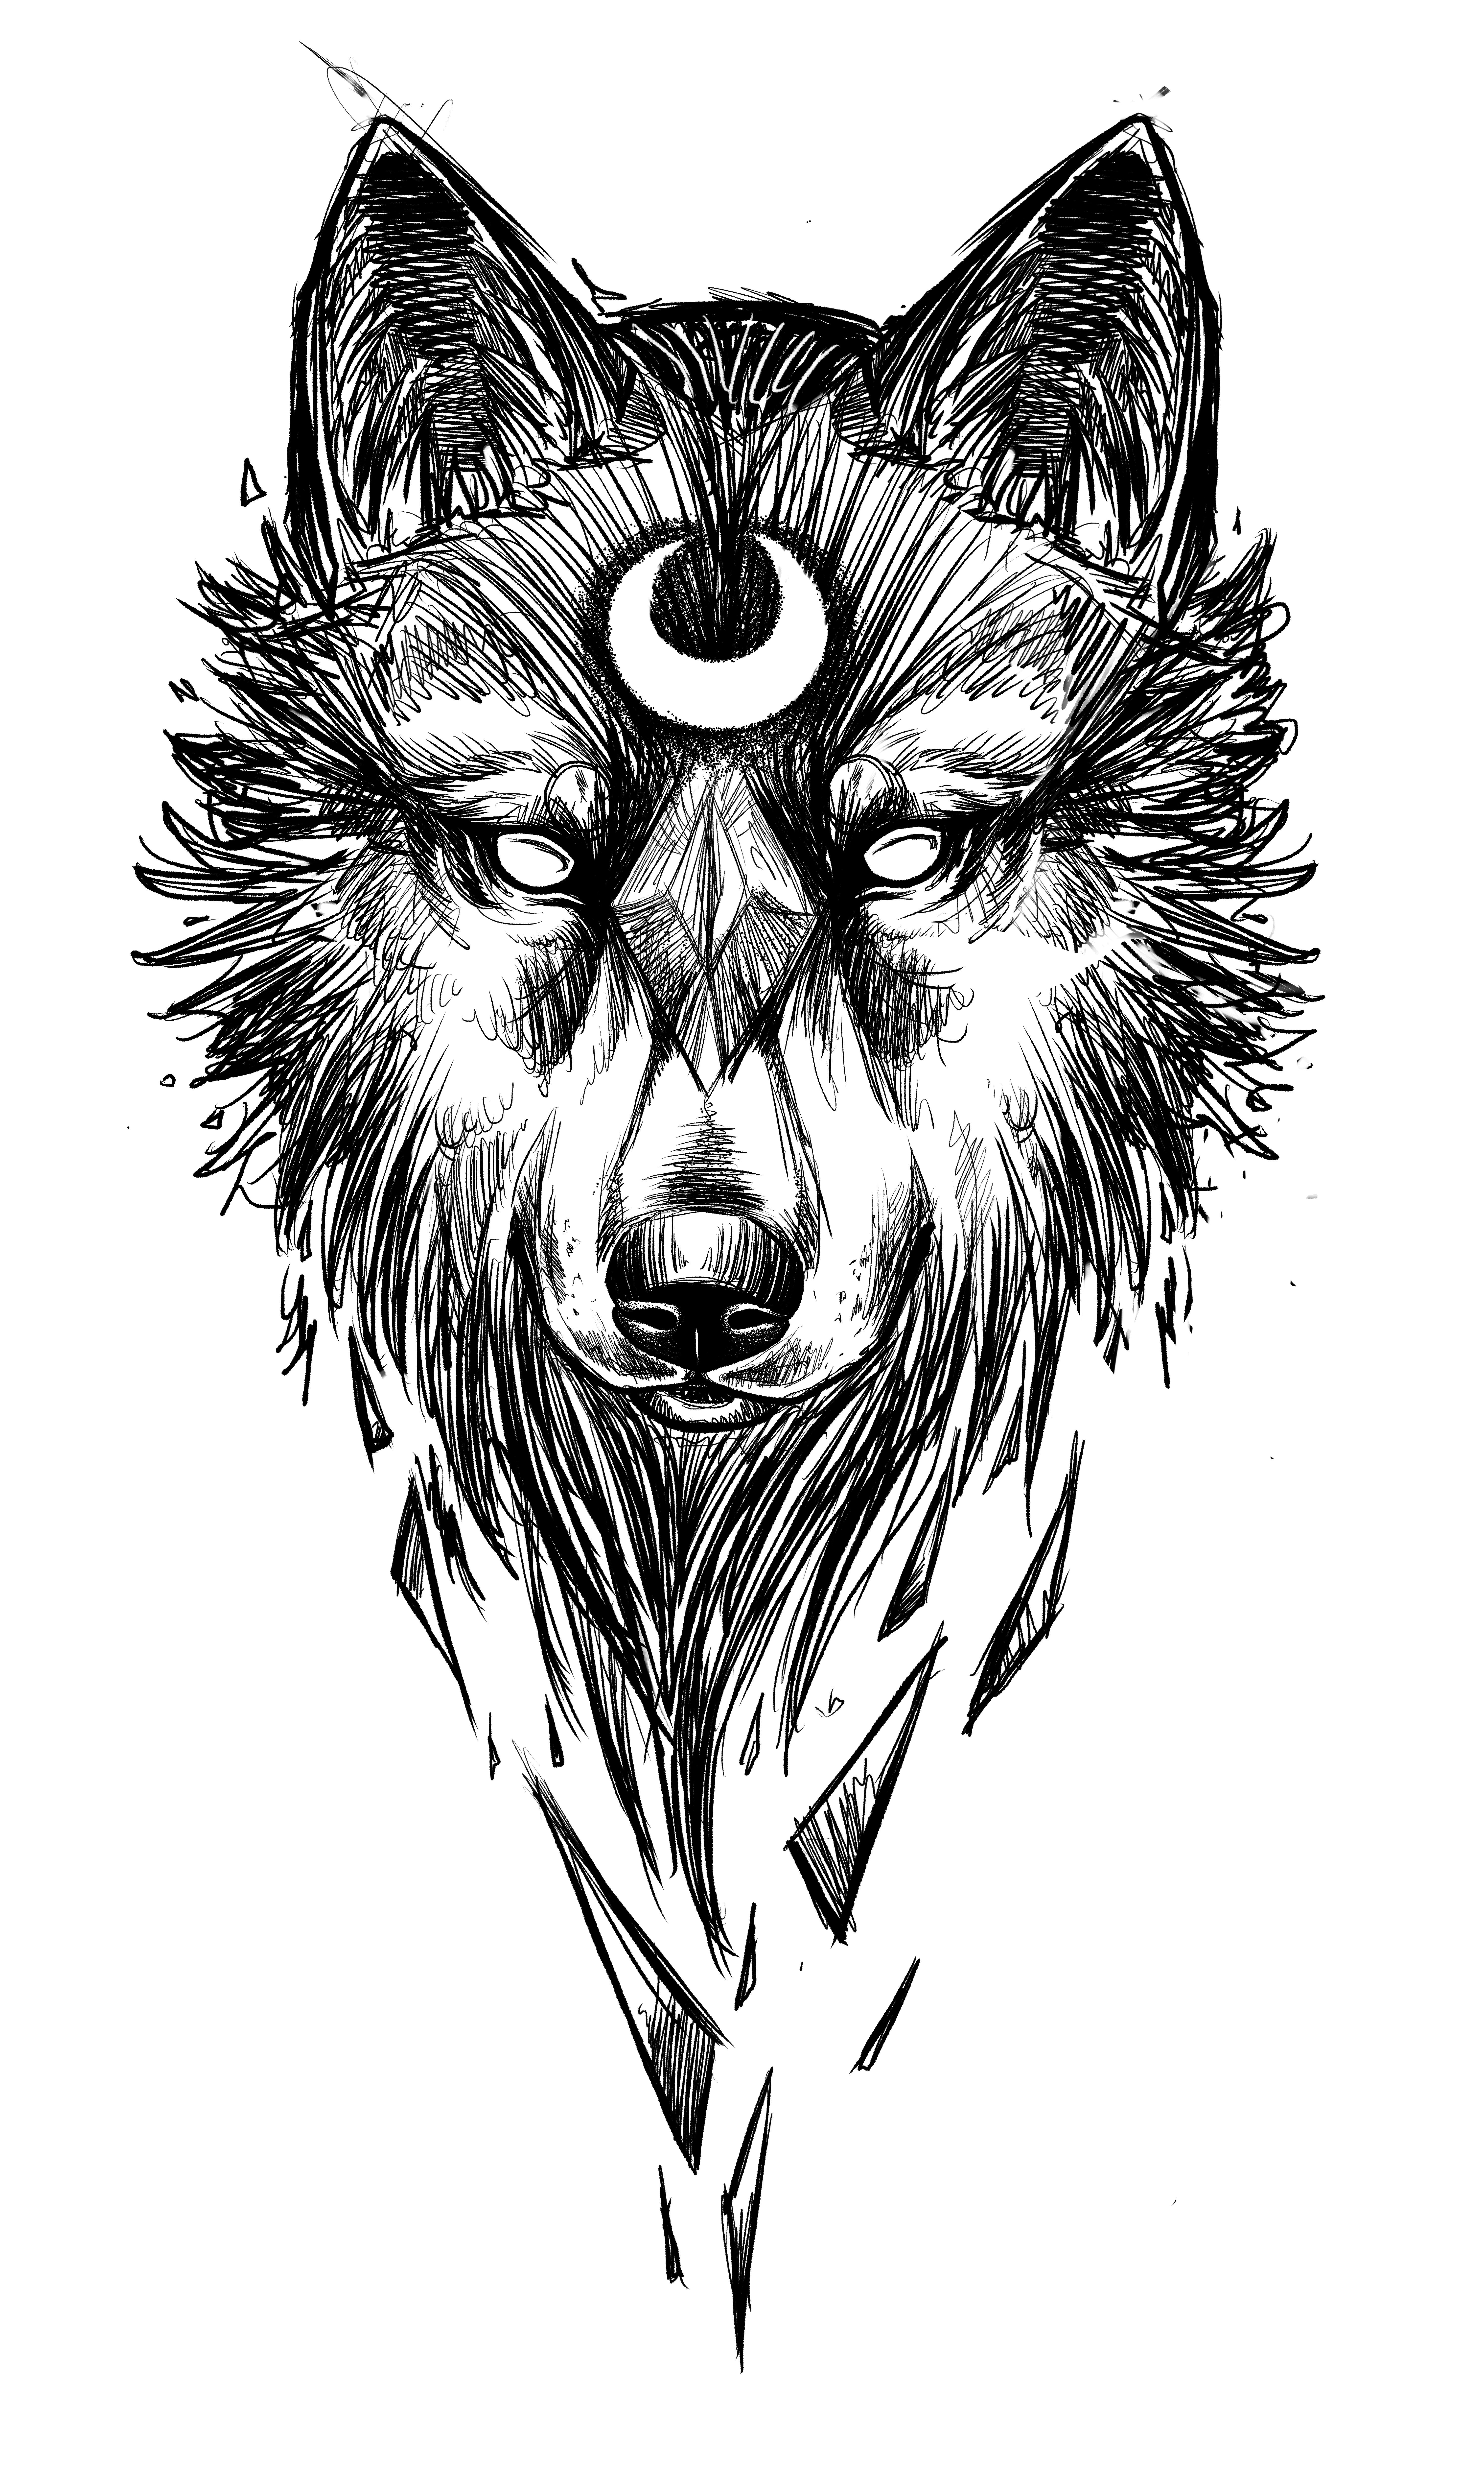 Sketch Wolf Tattoo Design By Chestnut Tattoo Desenho Tatuagem Lobo Tatuagem Desenho De Tatuagem De Lobo